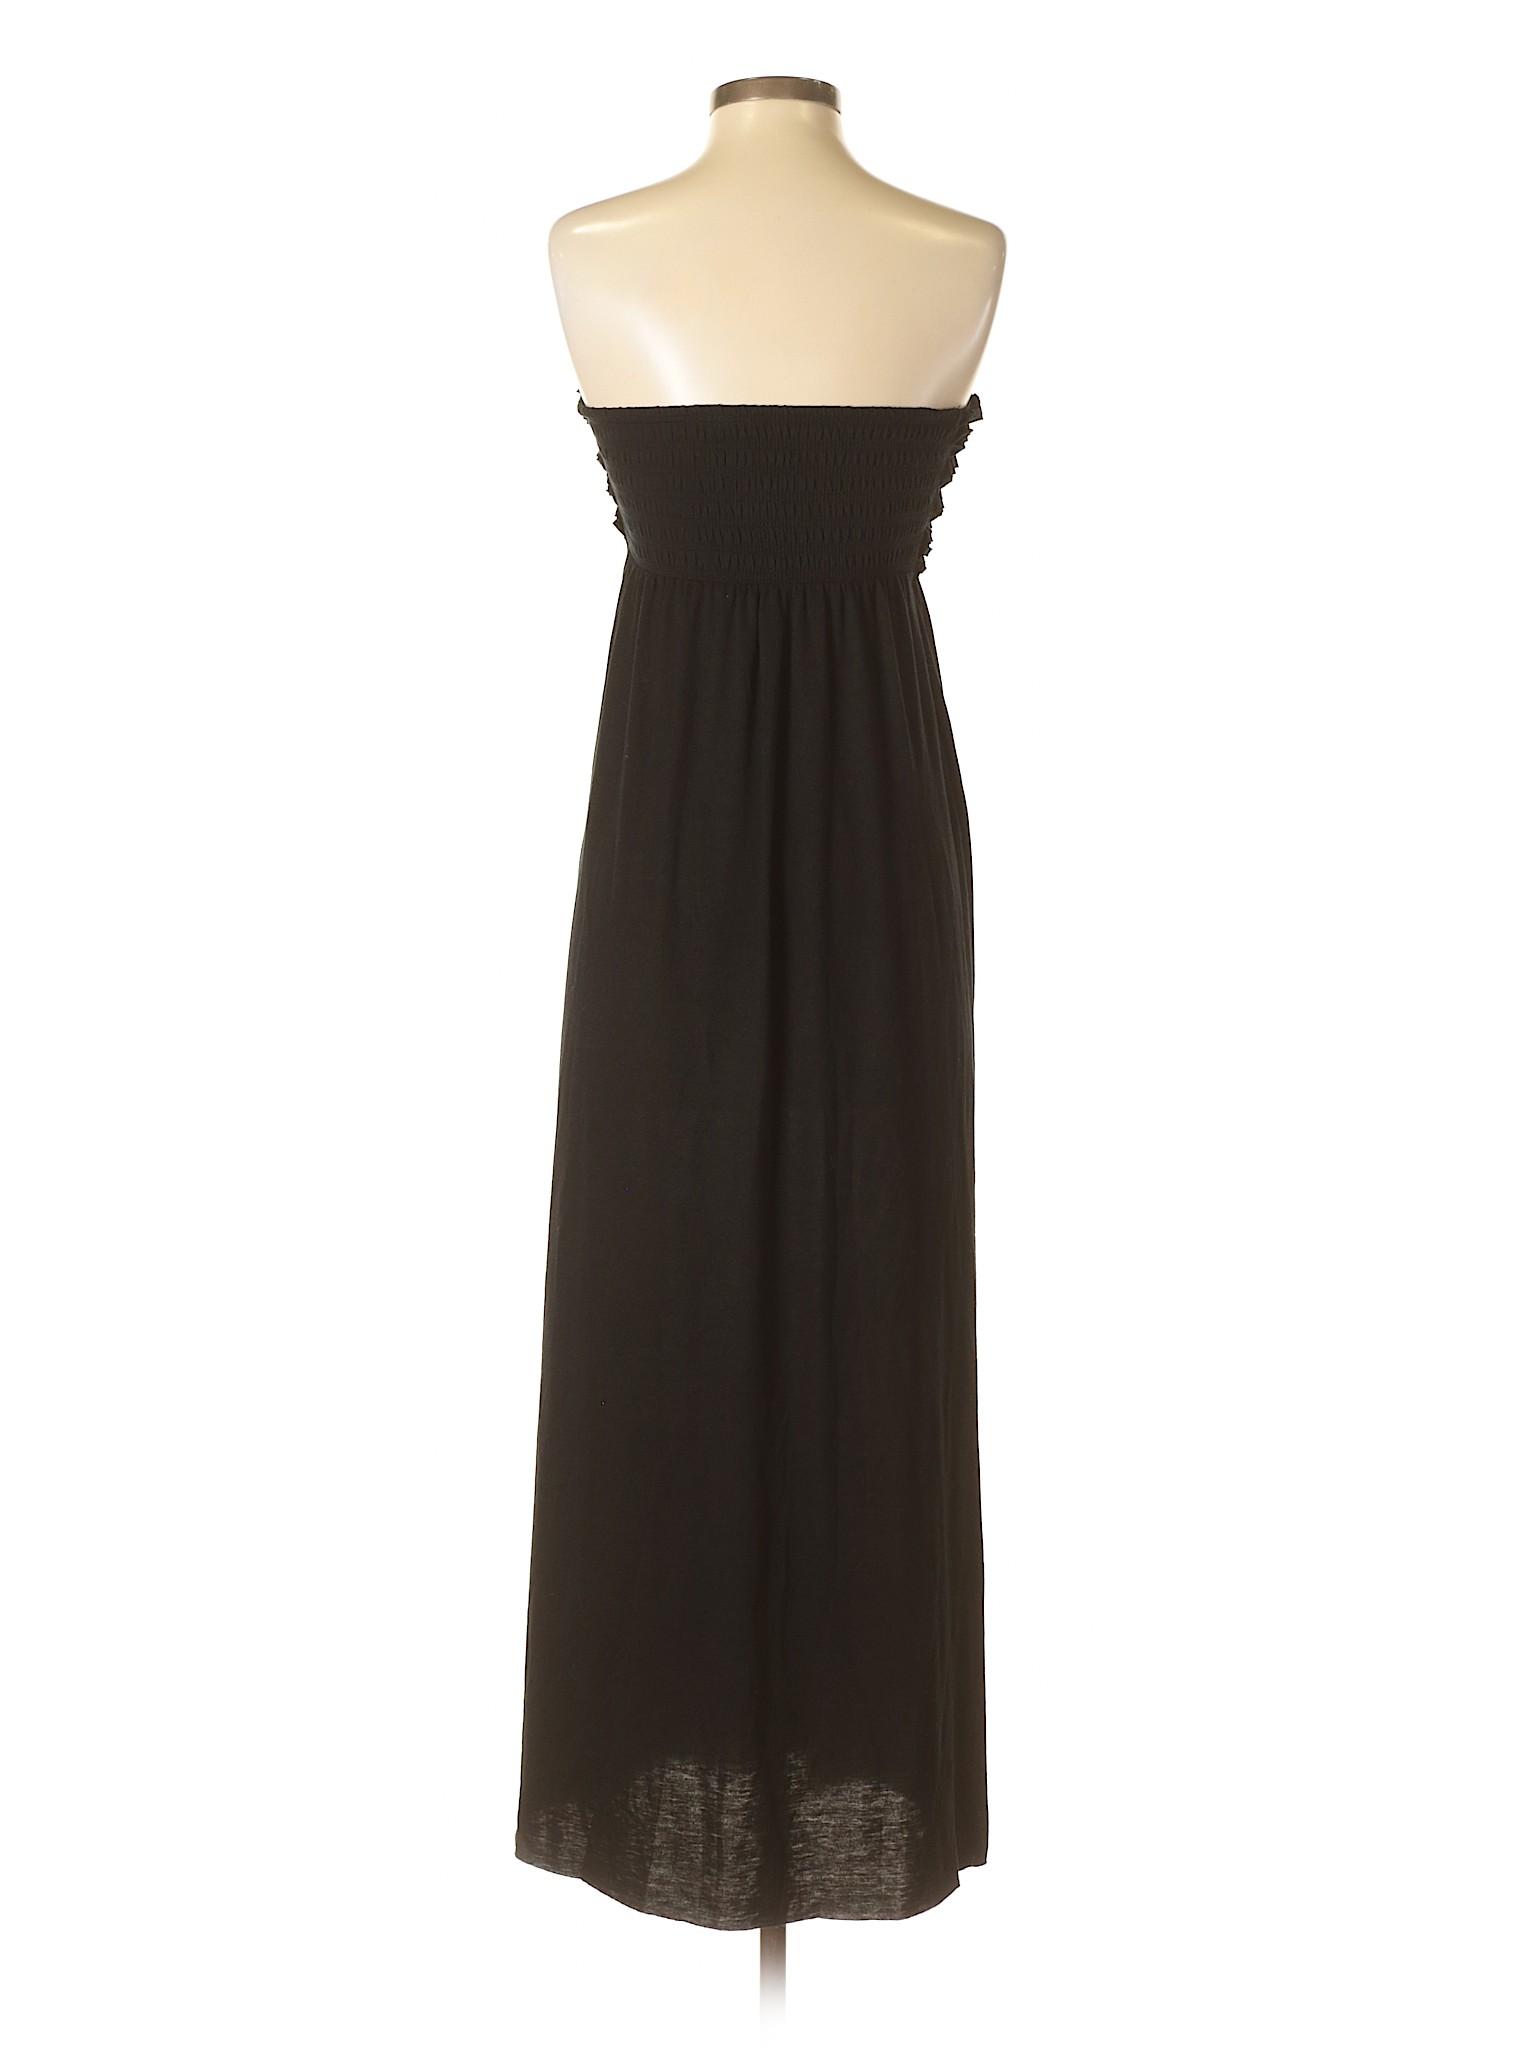 Dress Selling Casual Xhilaration Dress Xhilaration Selling Selling Xhilaration Casual nTSPZZ